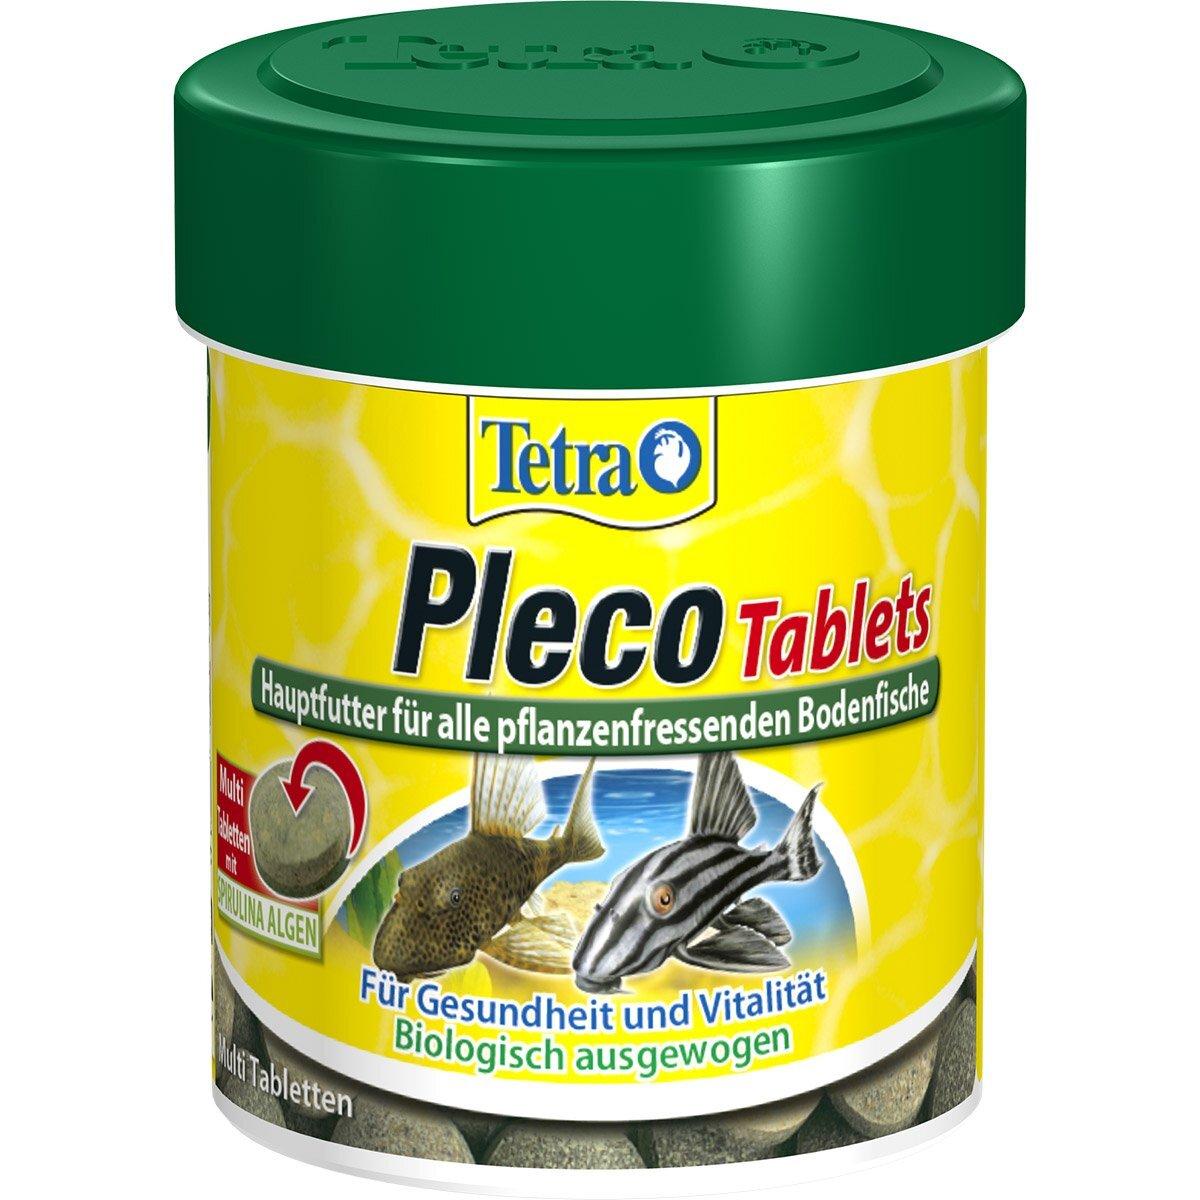 Bild 1 von Tetra Pleco Tablets